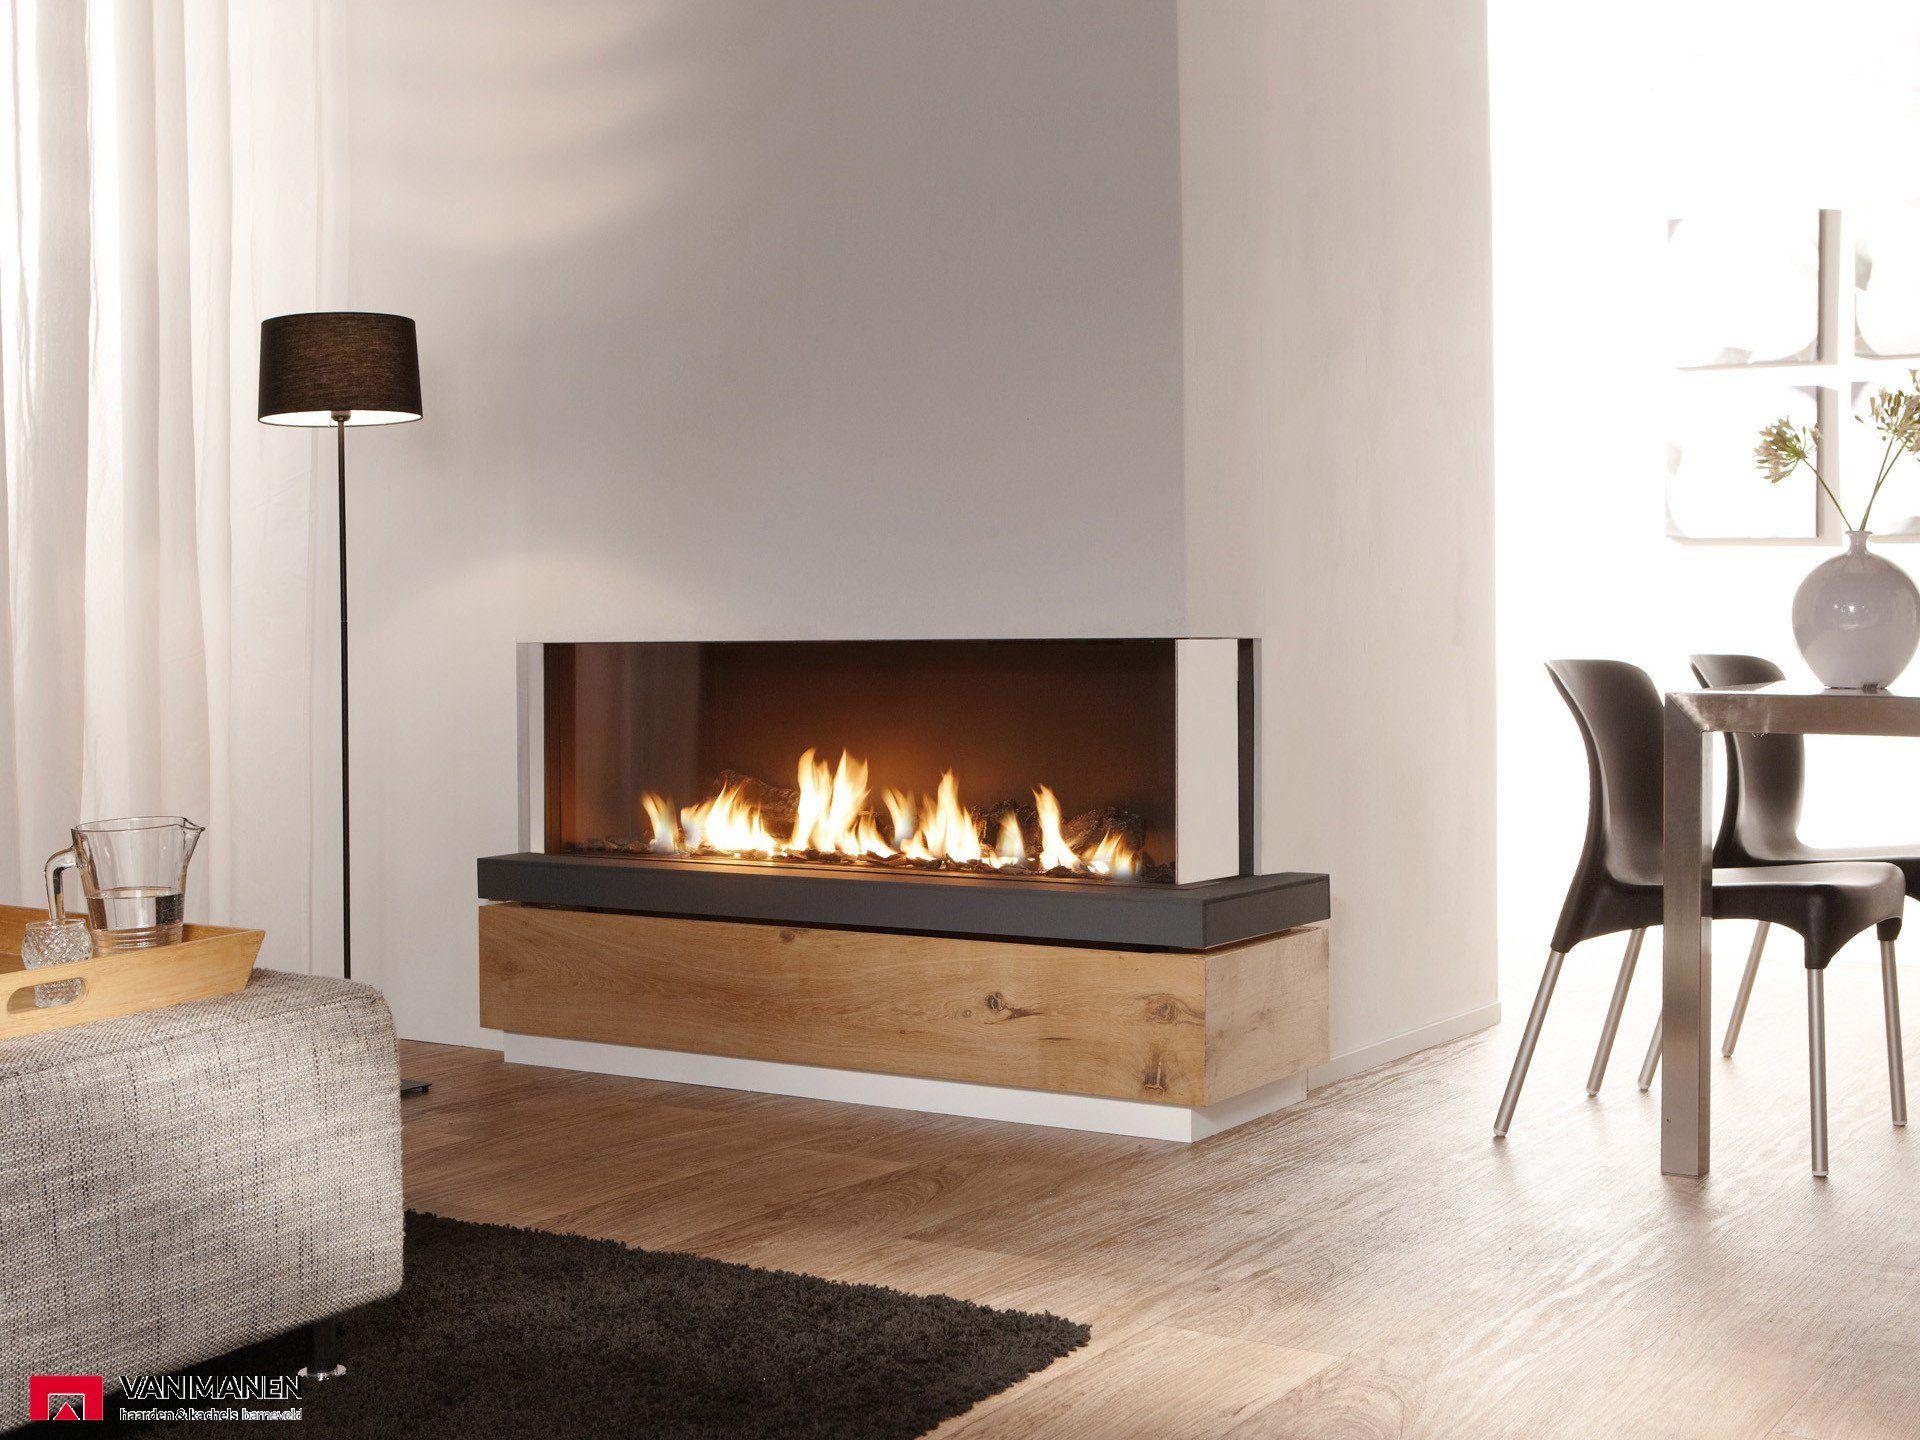 2 sided corner fireplace google search dvd fireplace pinterest